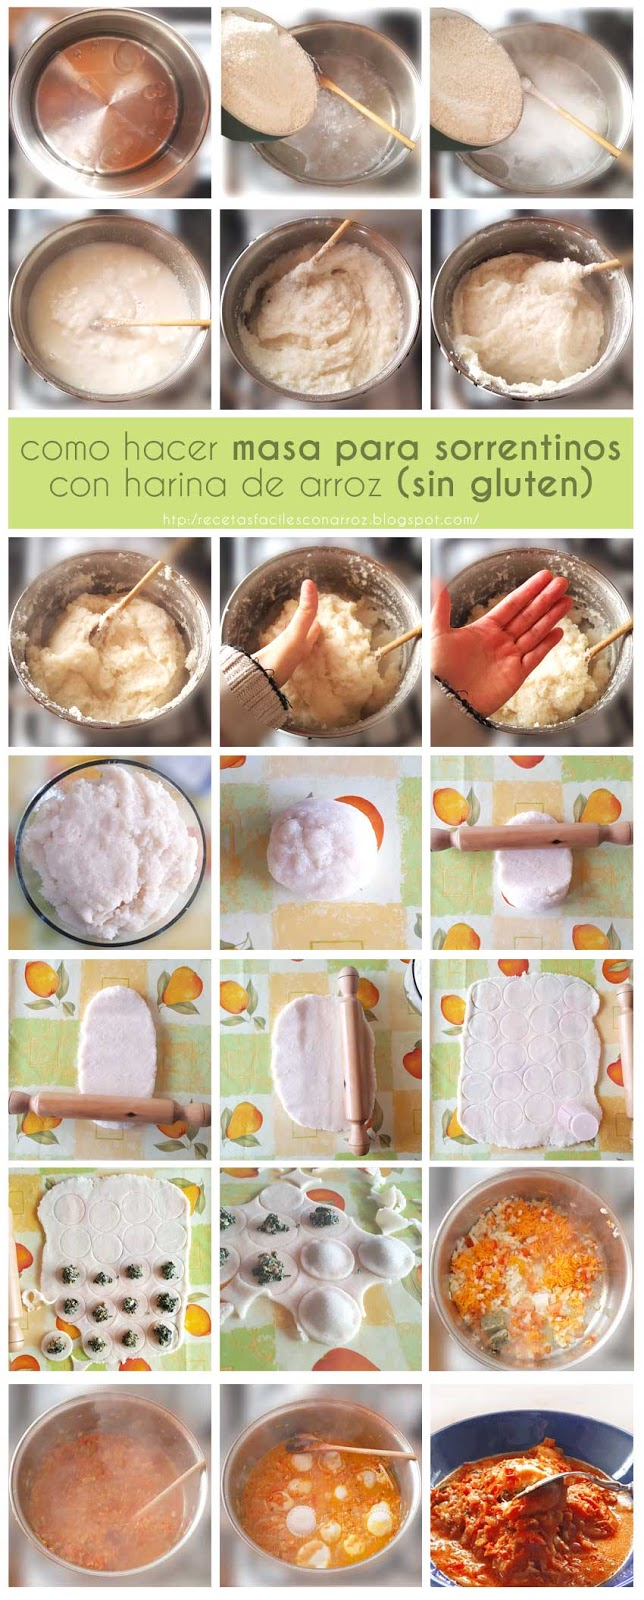 sorrentinos sin gluten foto-tutorial